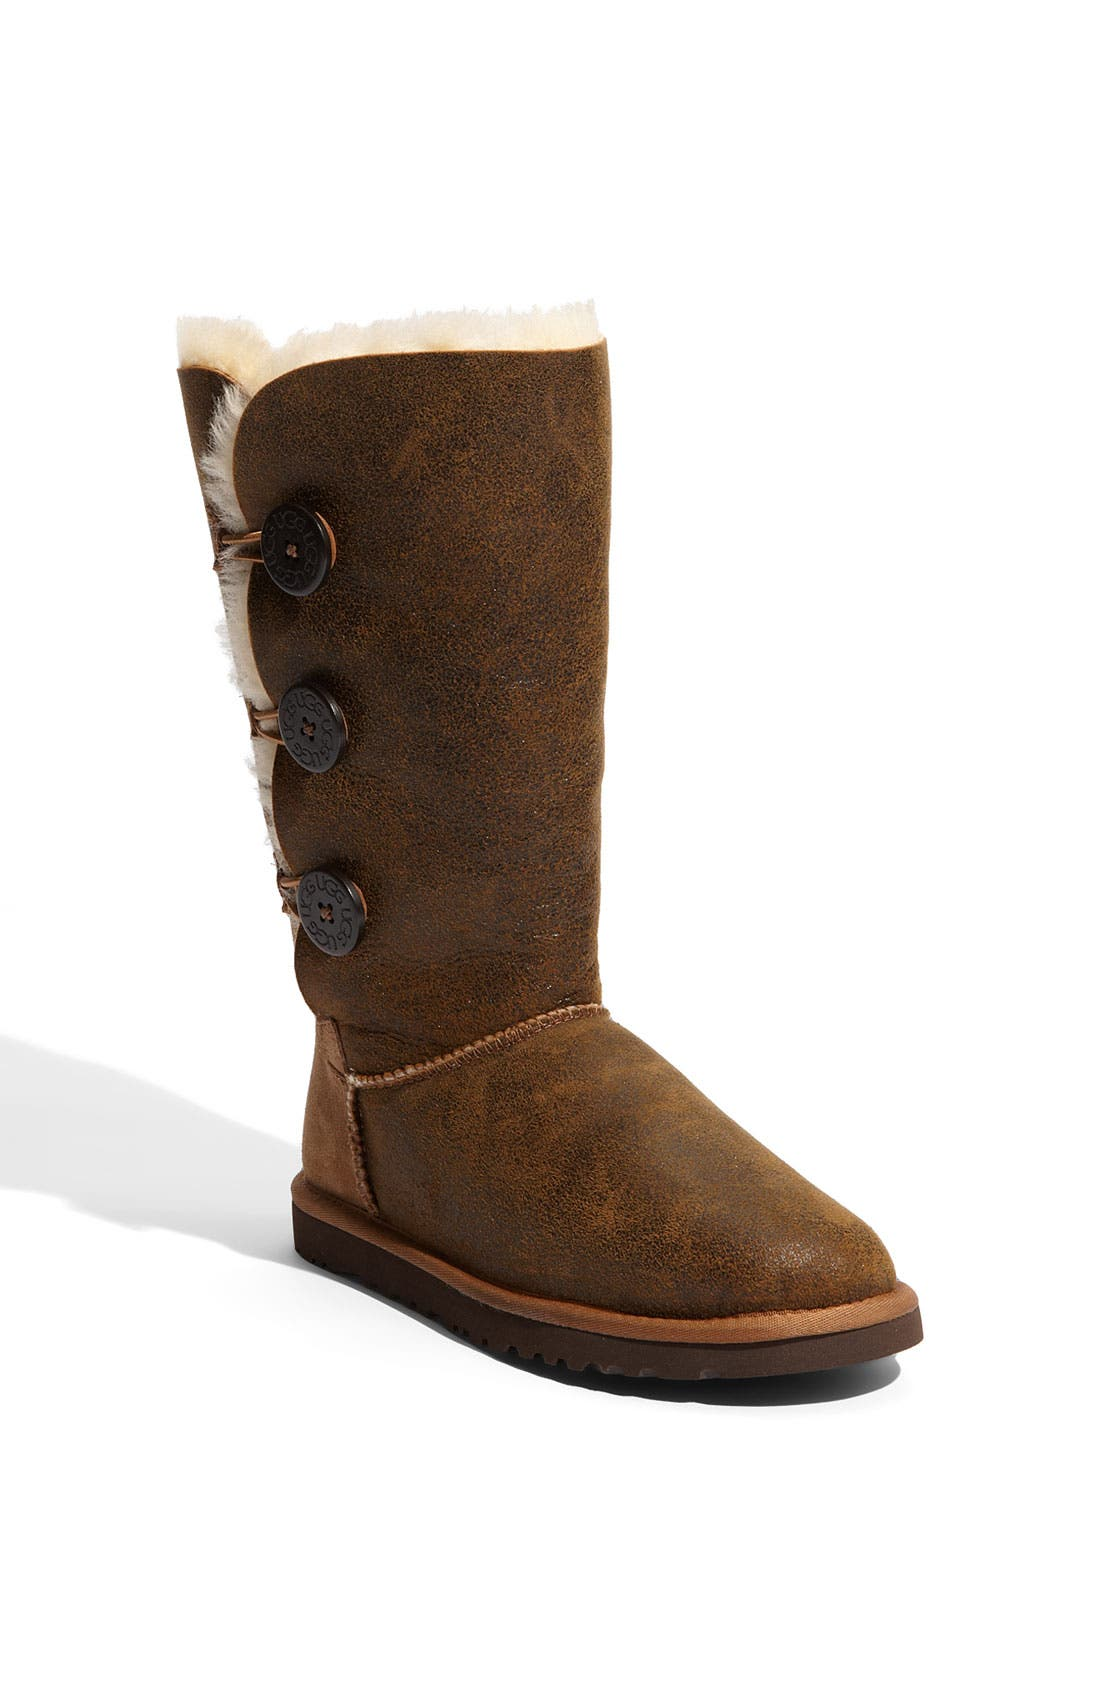 Main Image - UGG® Australia 'Bailey Button Triplet' Boot (Bomber) (Women)